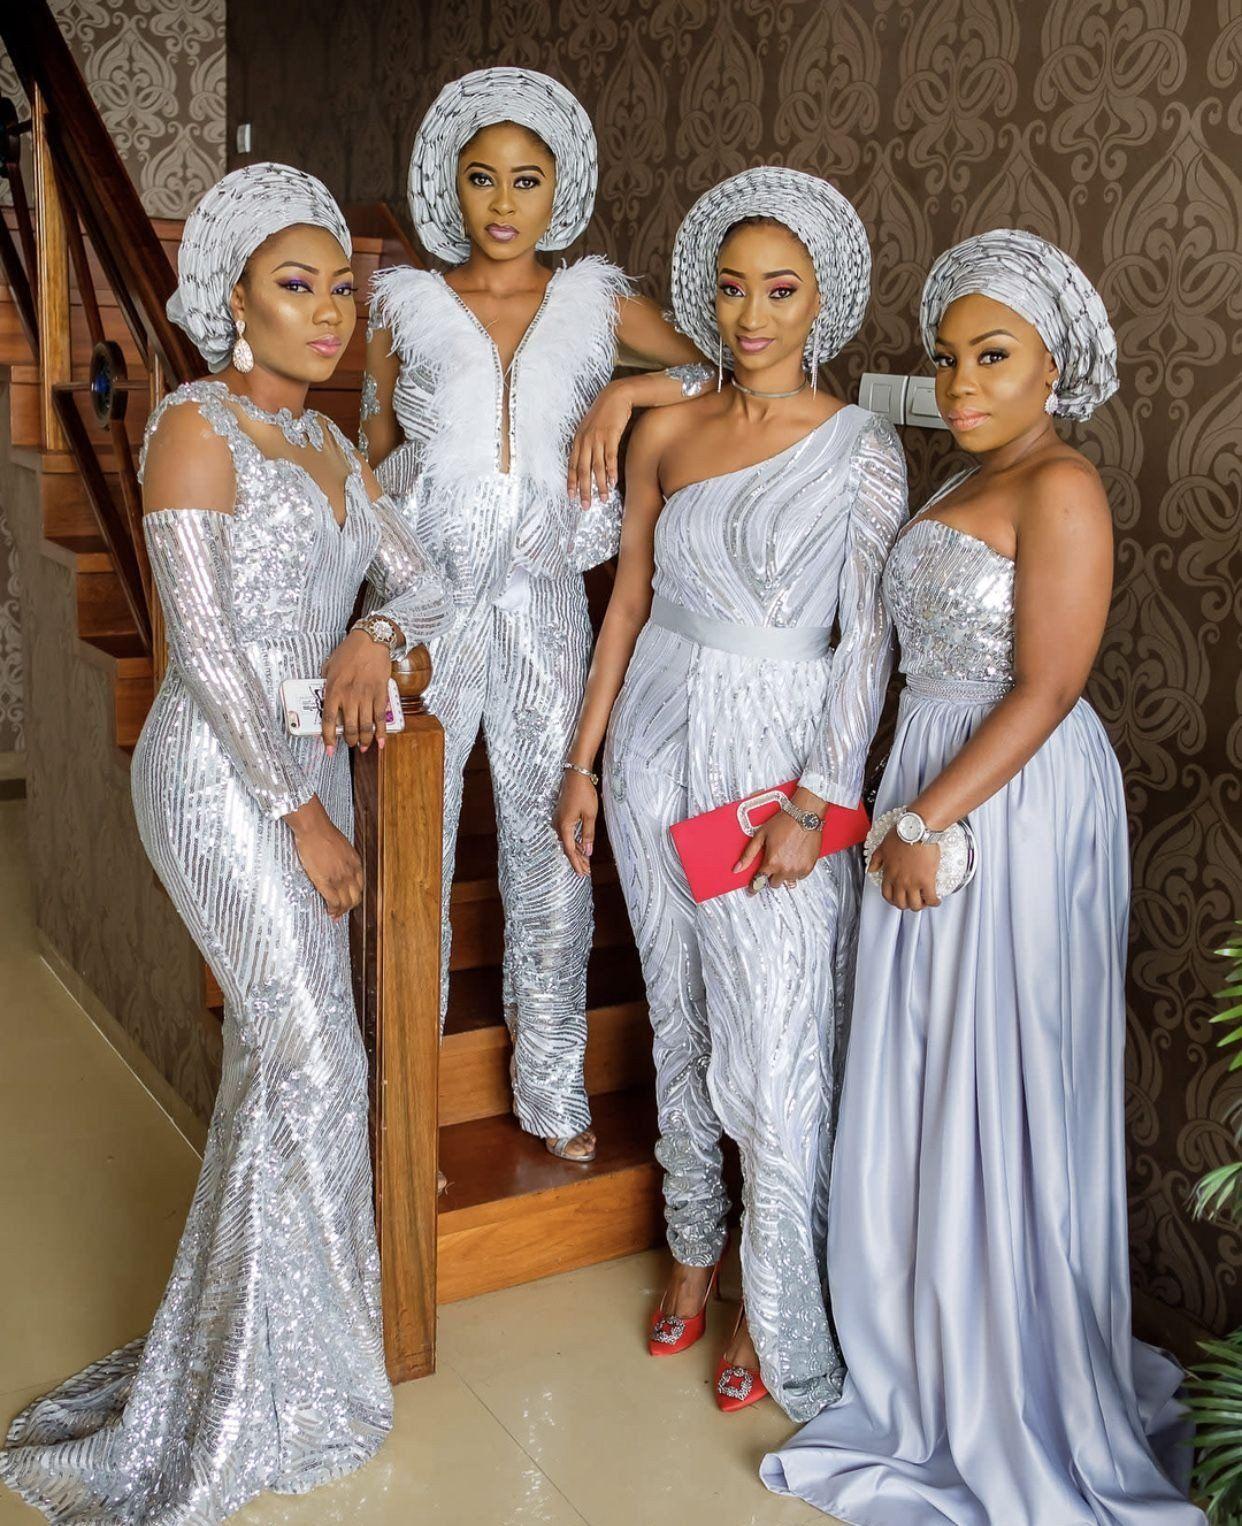 Nigerian Traditional Wedding Dress Unique Asoebi Styles My African Kings Queens In 2020 African Fashion Dresses African Bridesmaid Dresses Nigerian Wedding Dress